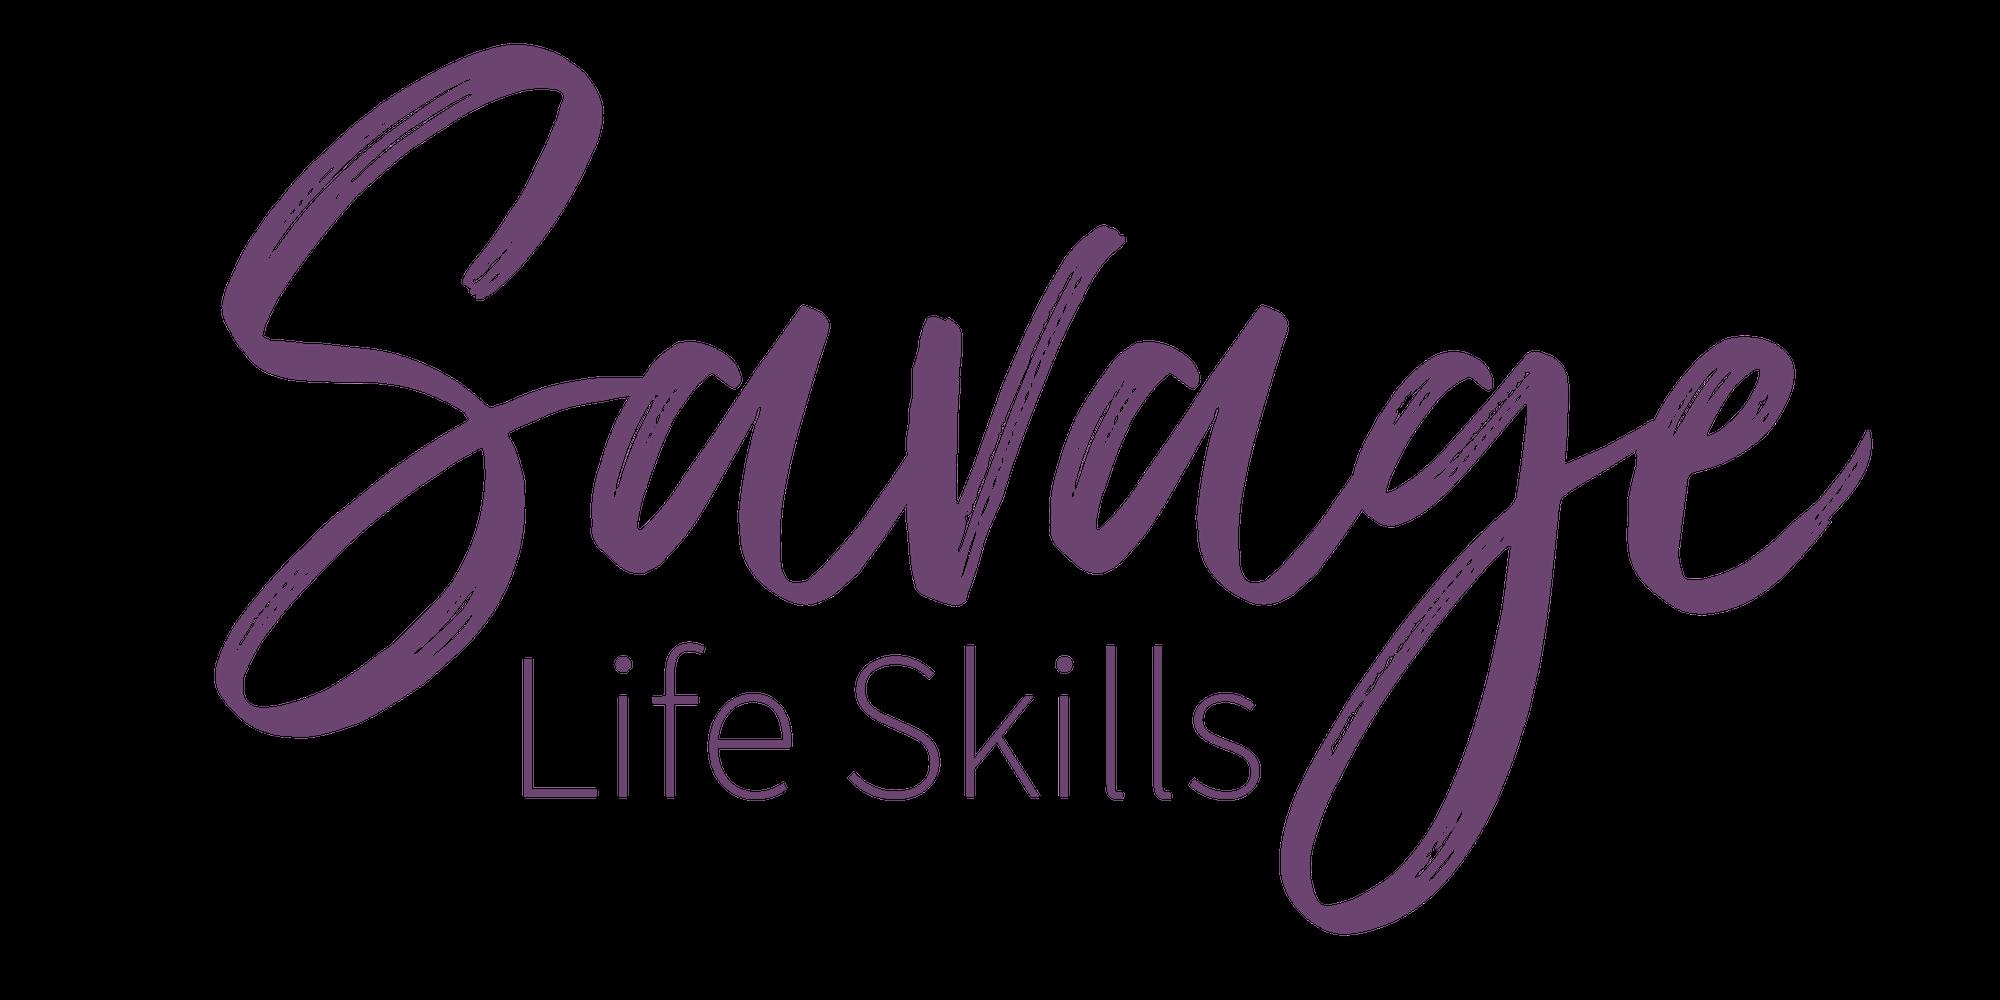 Savage Life Skills Retina Logo